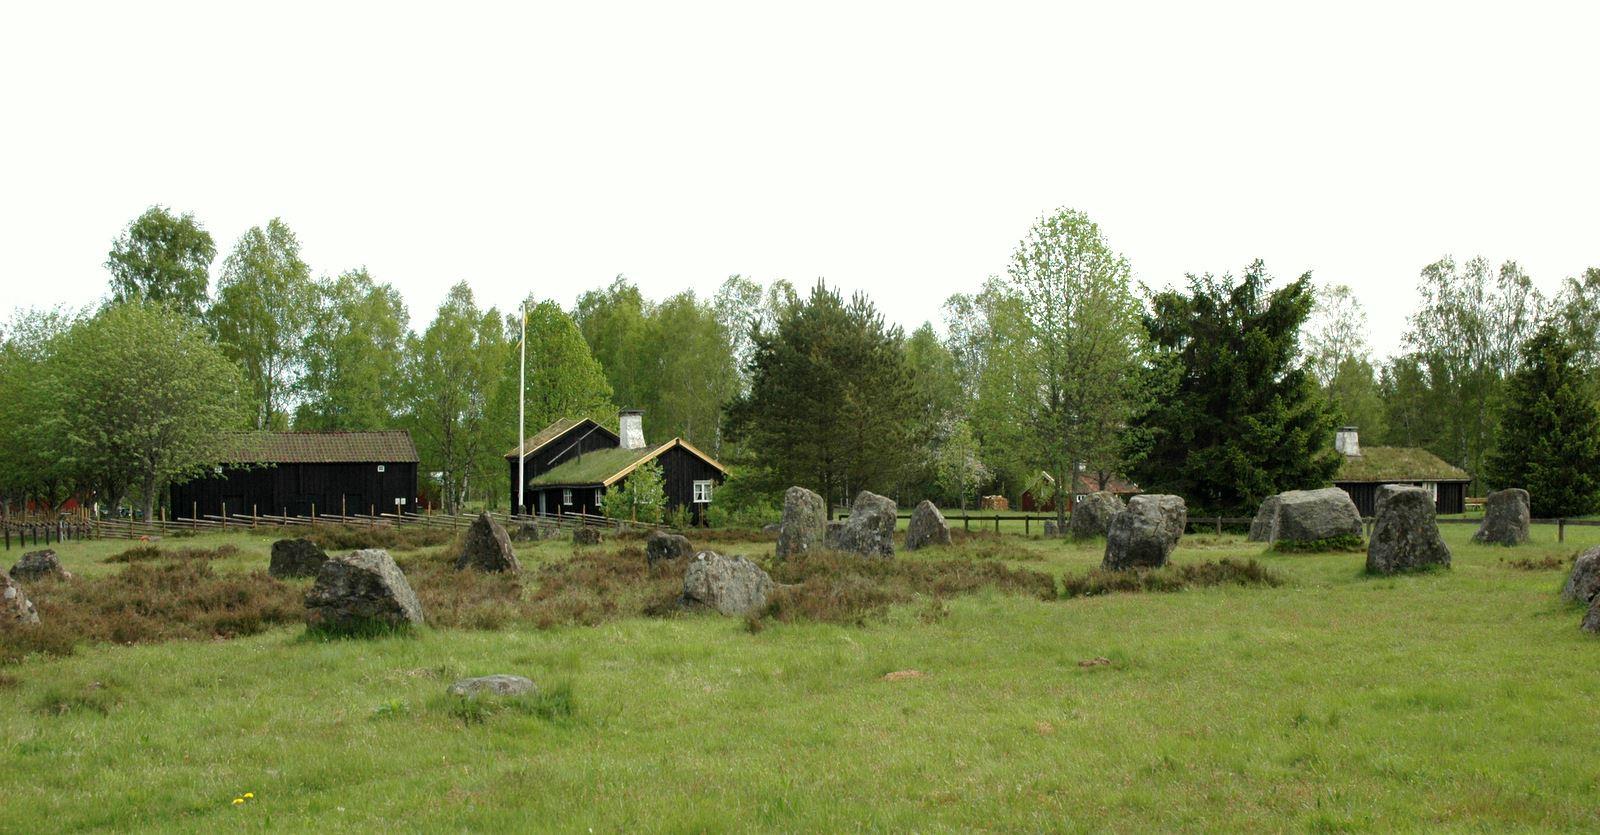 Gislaveds kommun,  © Gislaveds kommun, Villstad folk museum, Smålandsstenar